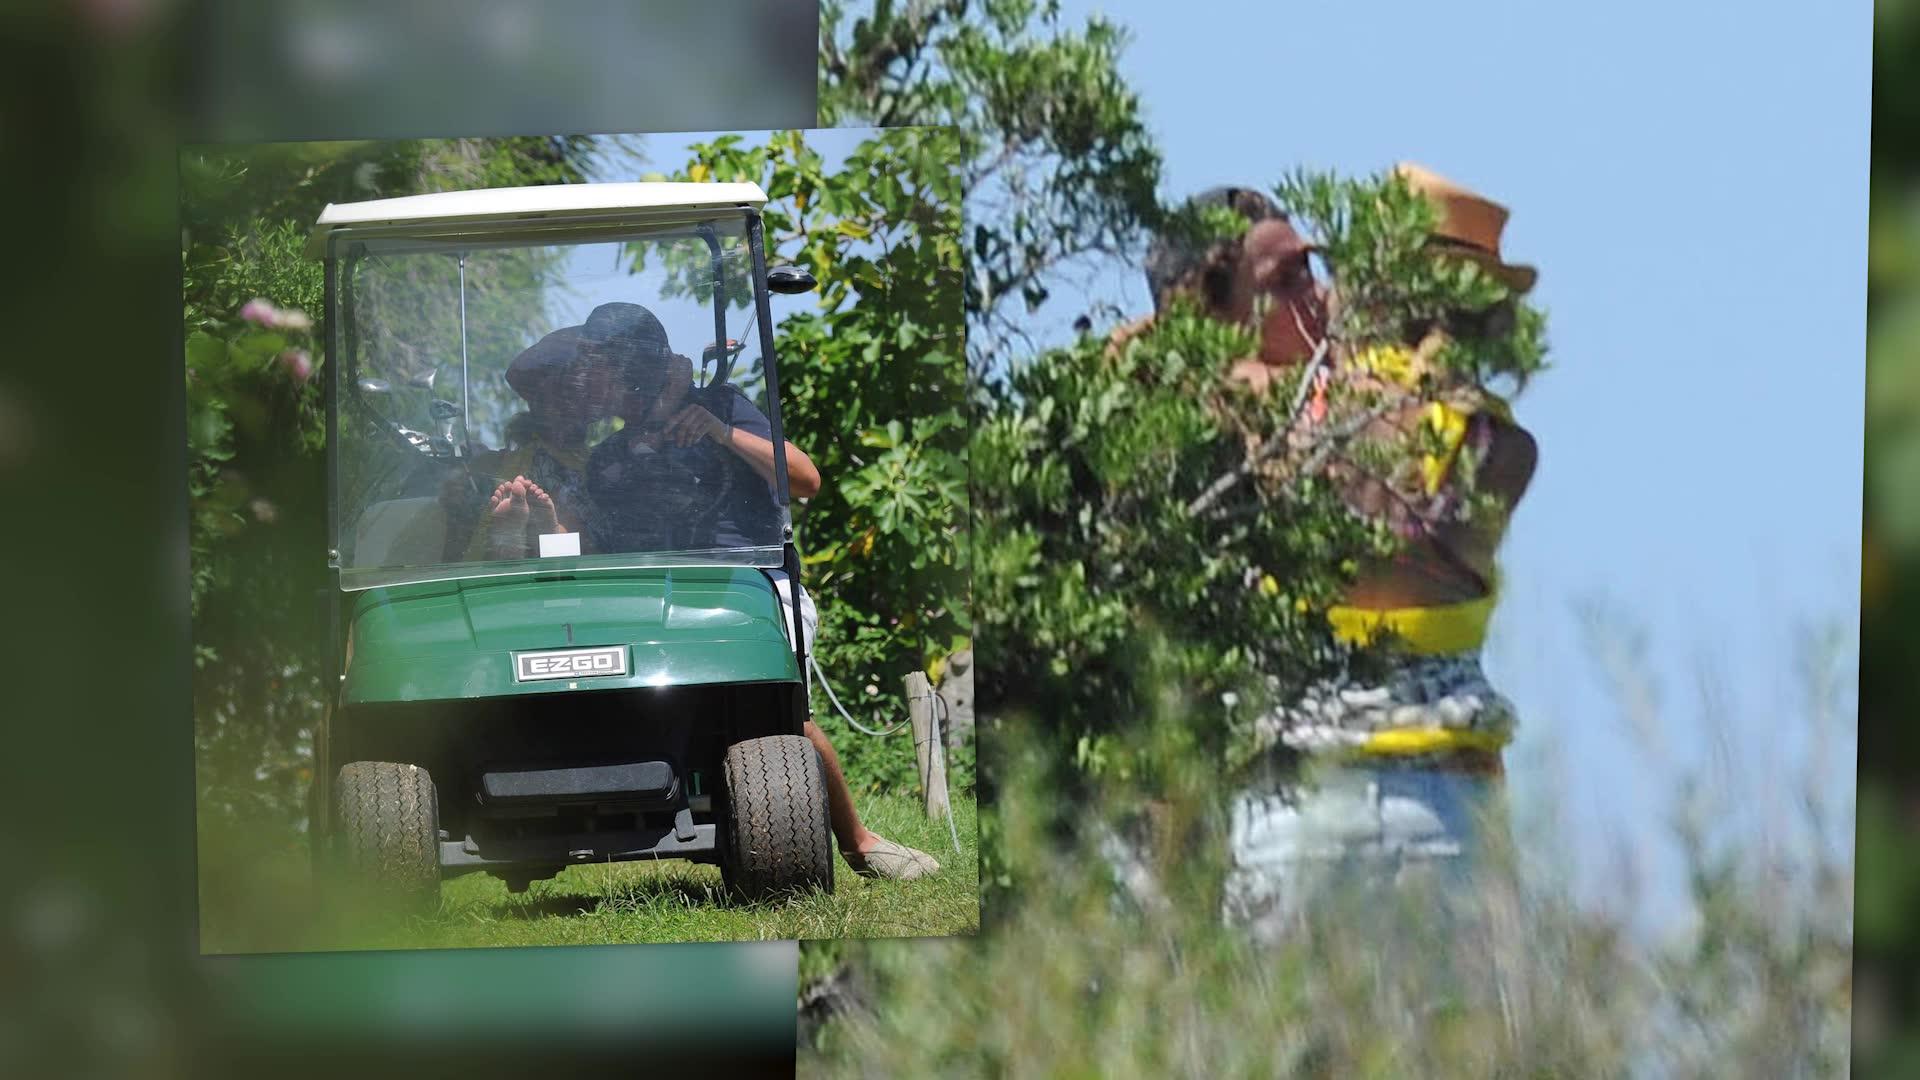 Heidi Klum & Vito Schnabel Play A Round of Golf in Italy